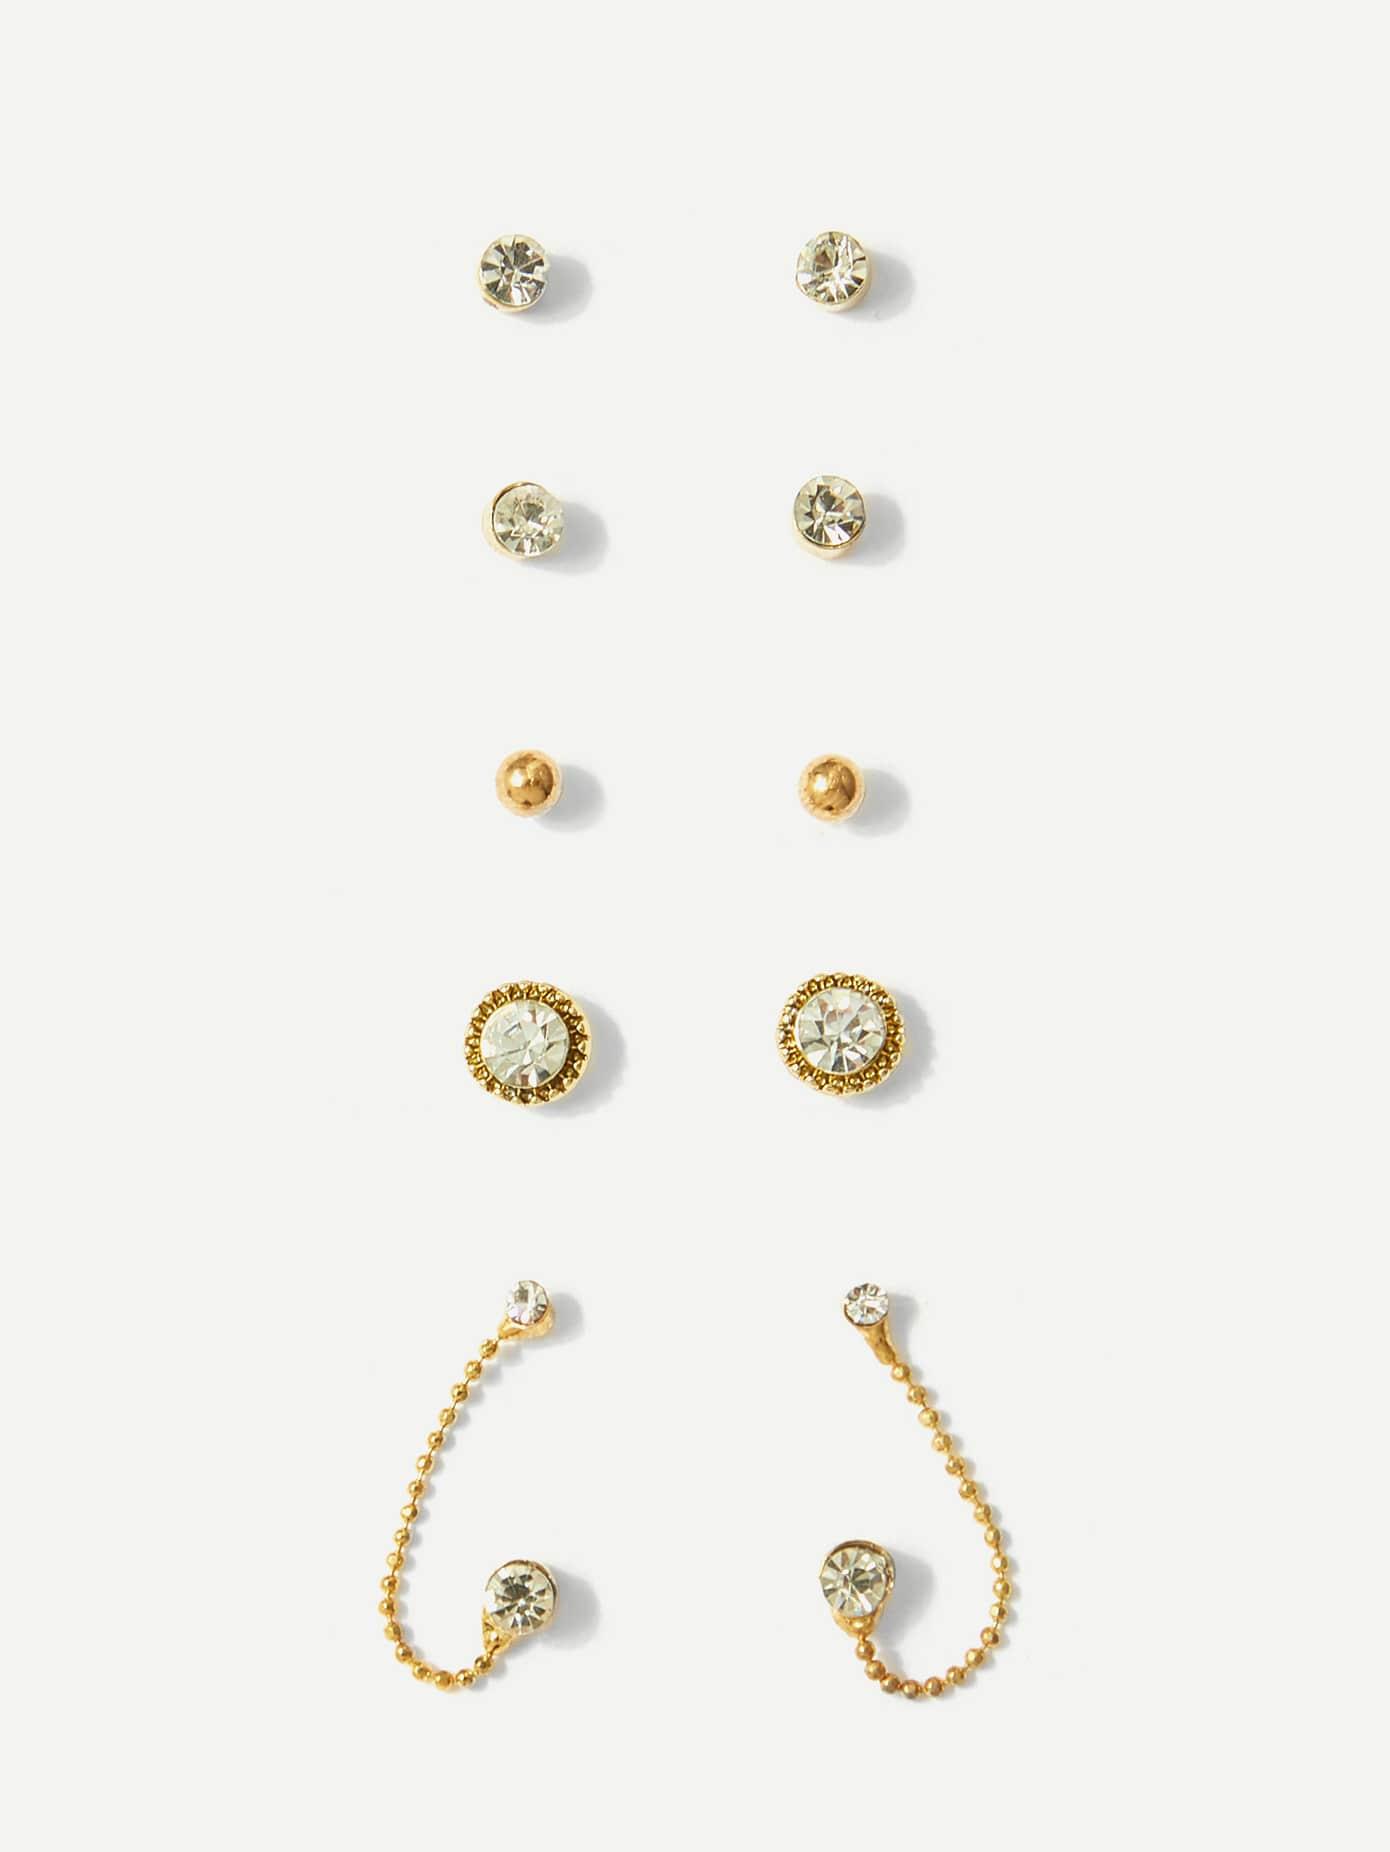 Купить Серьги для ключей Rhinestone с бриллиантами 5pairs, null, SheIn